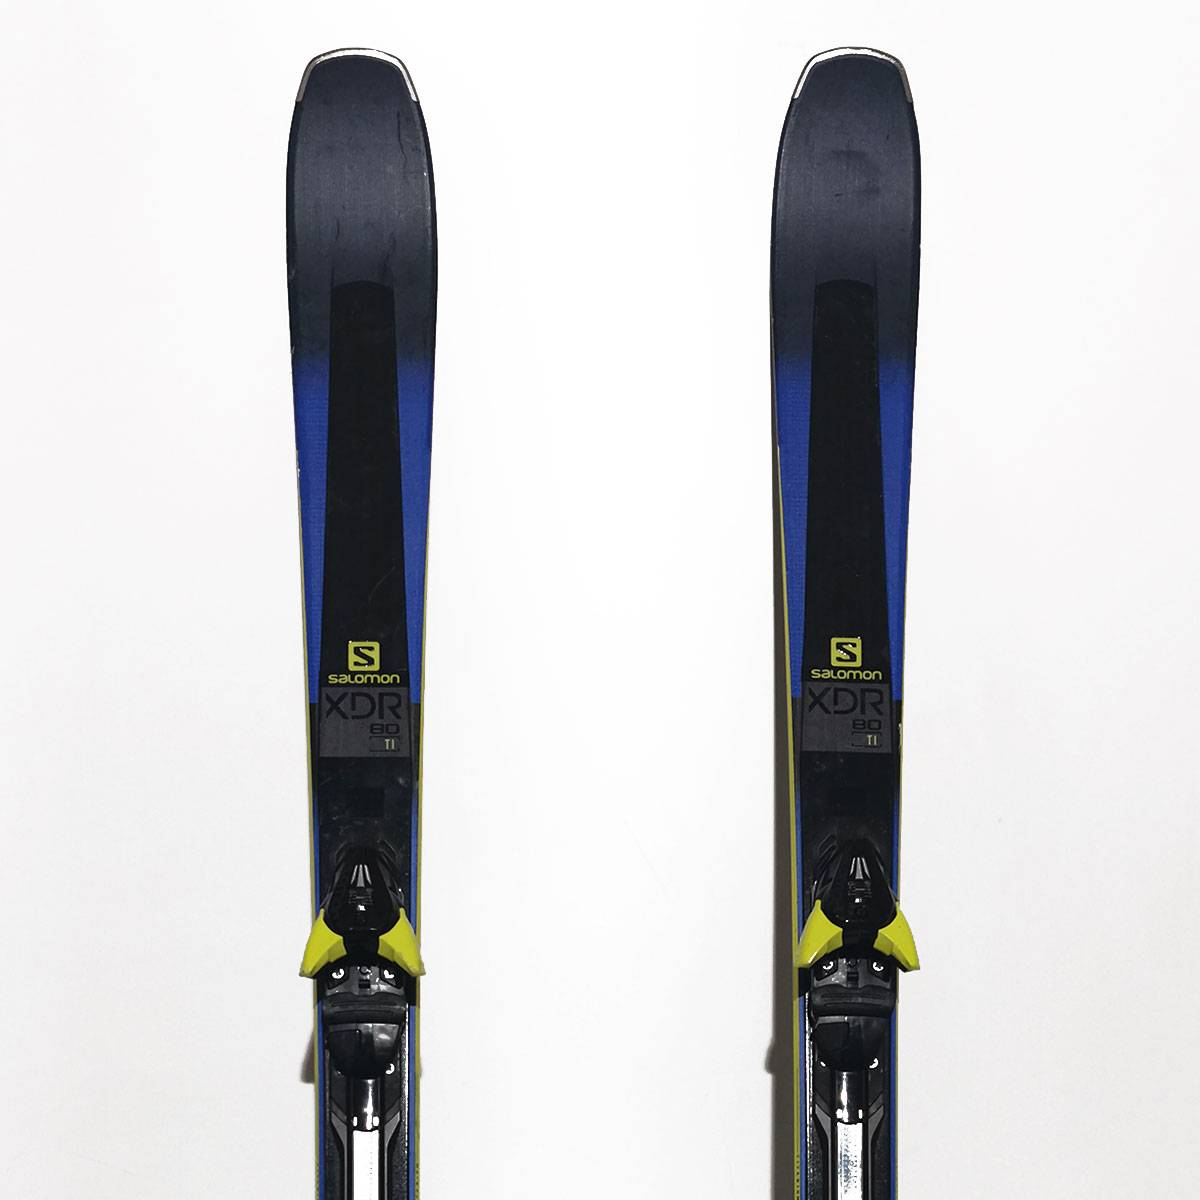 Schiuri Salomon XDR 80 TI Albastre